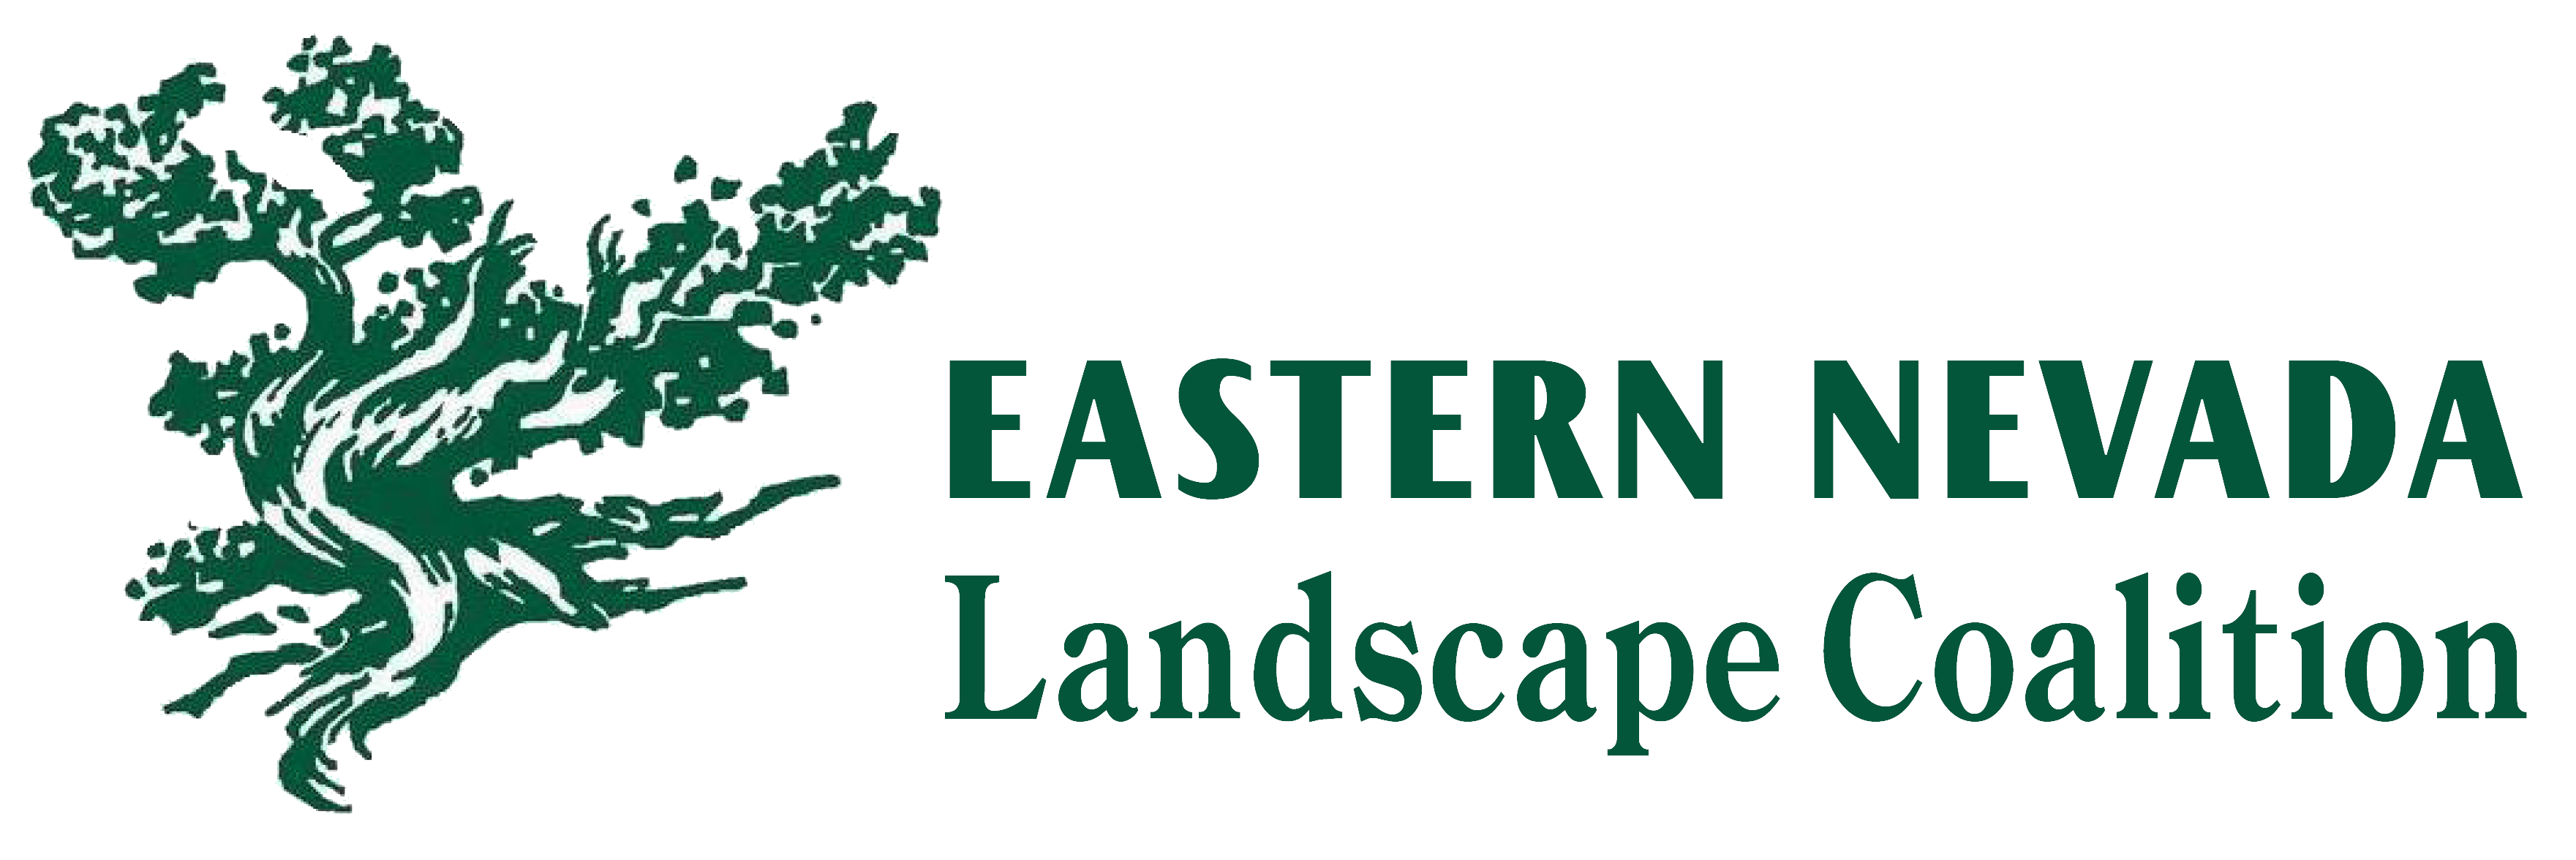 Eastern Nevada Landscape Coalition